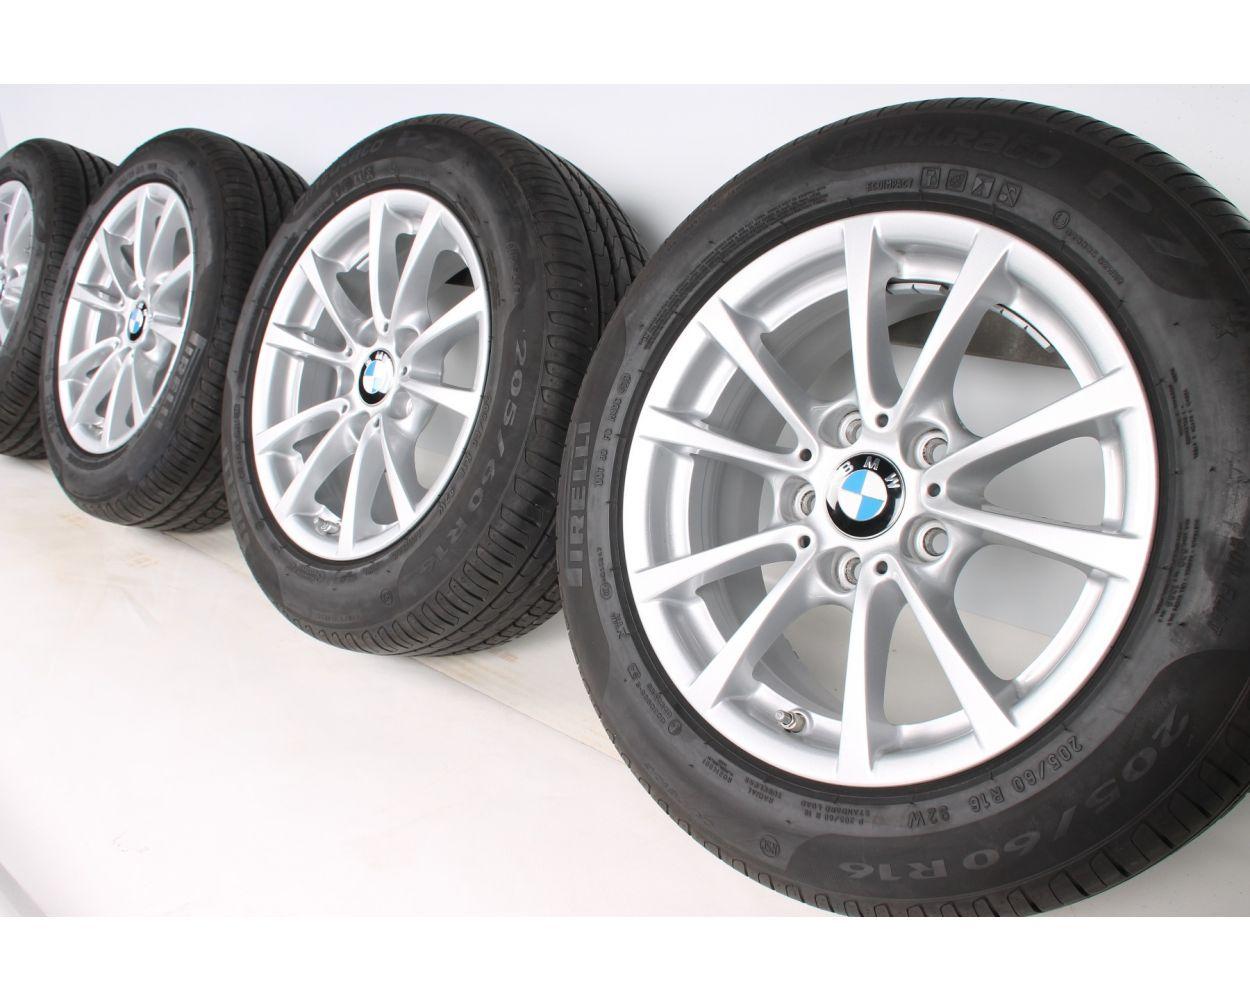 Bmw Summer Wheels 3er F30 F31 4er F32 F33 F36 16 Zoll 390 V